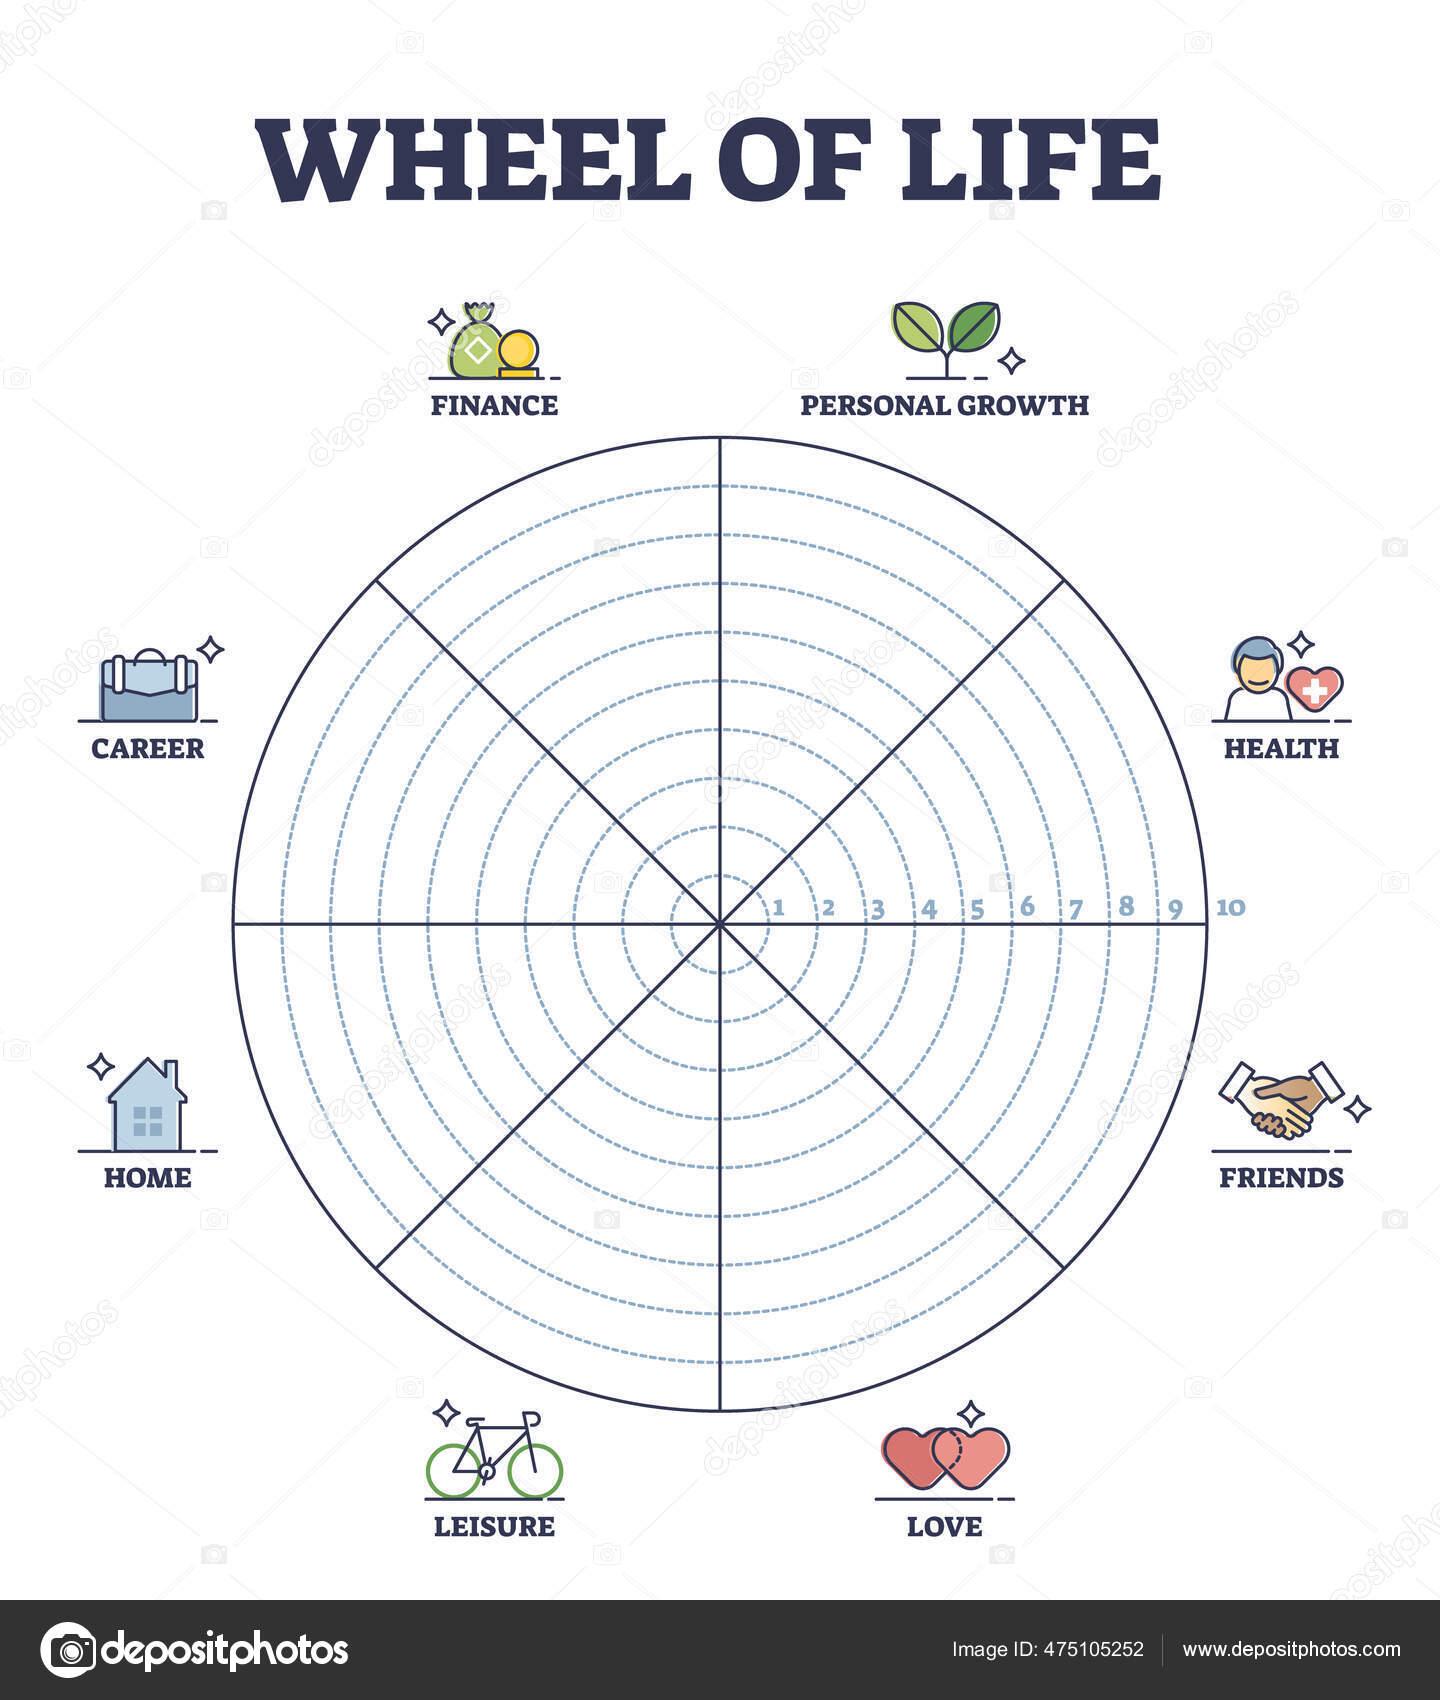 Wheel of life circular scheme as lifestyle balance control outline Regarding Blank Wheel Of Life Template